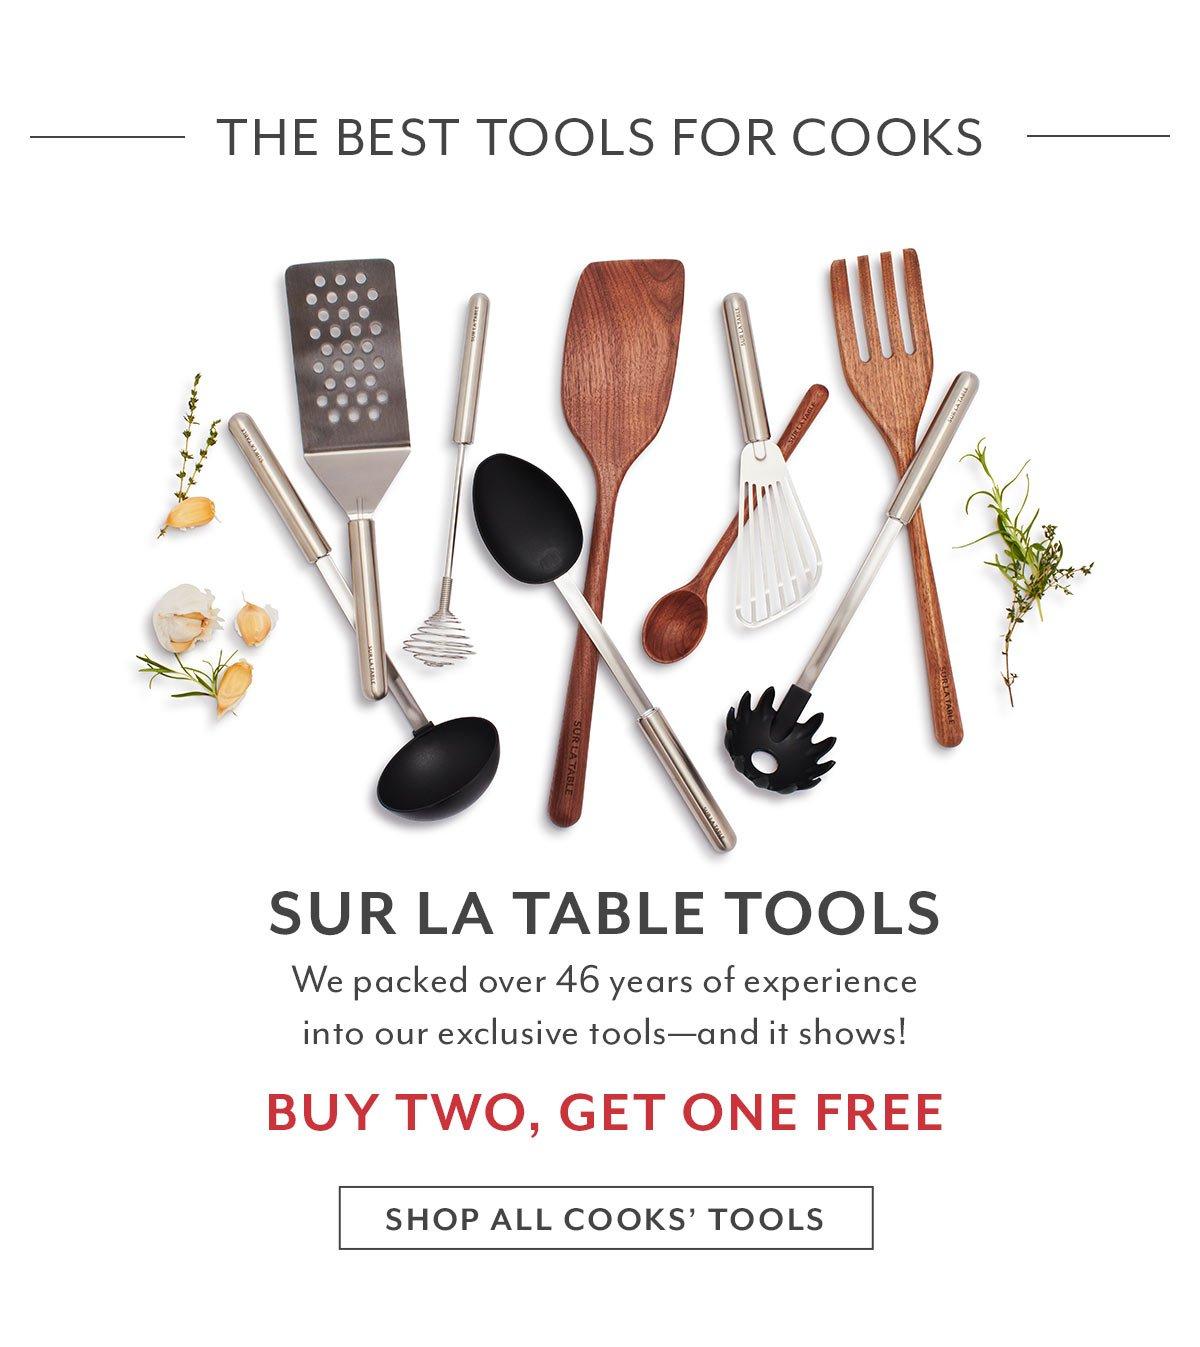 Sur La Table Tools